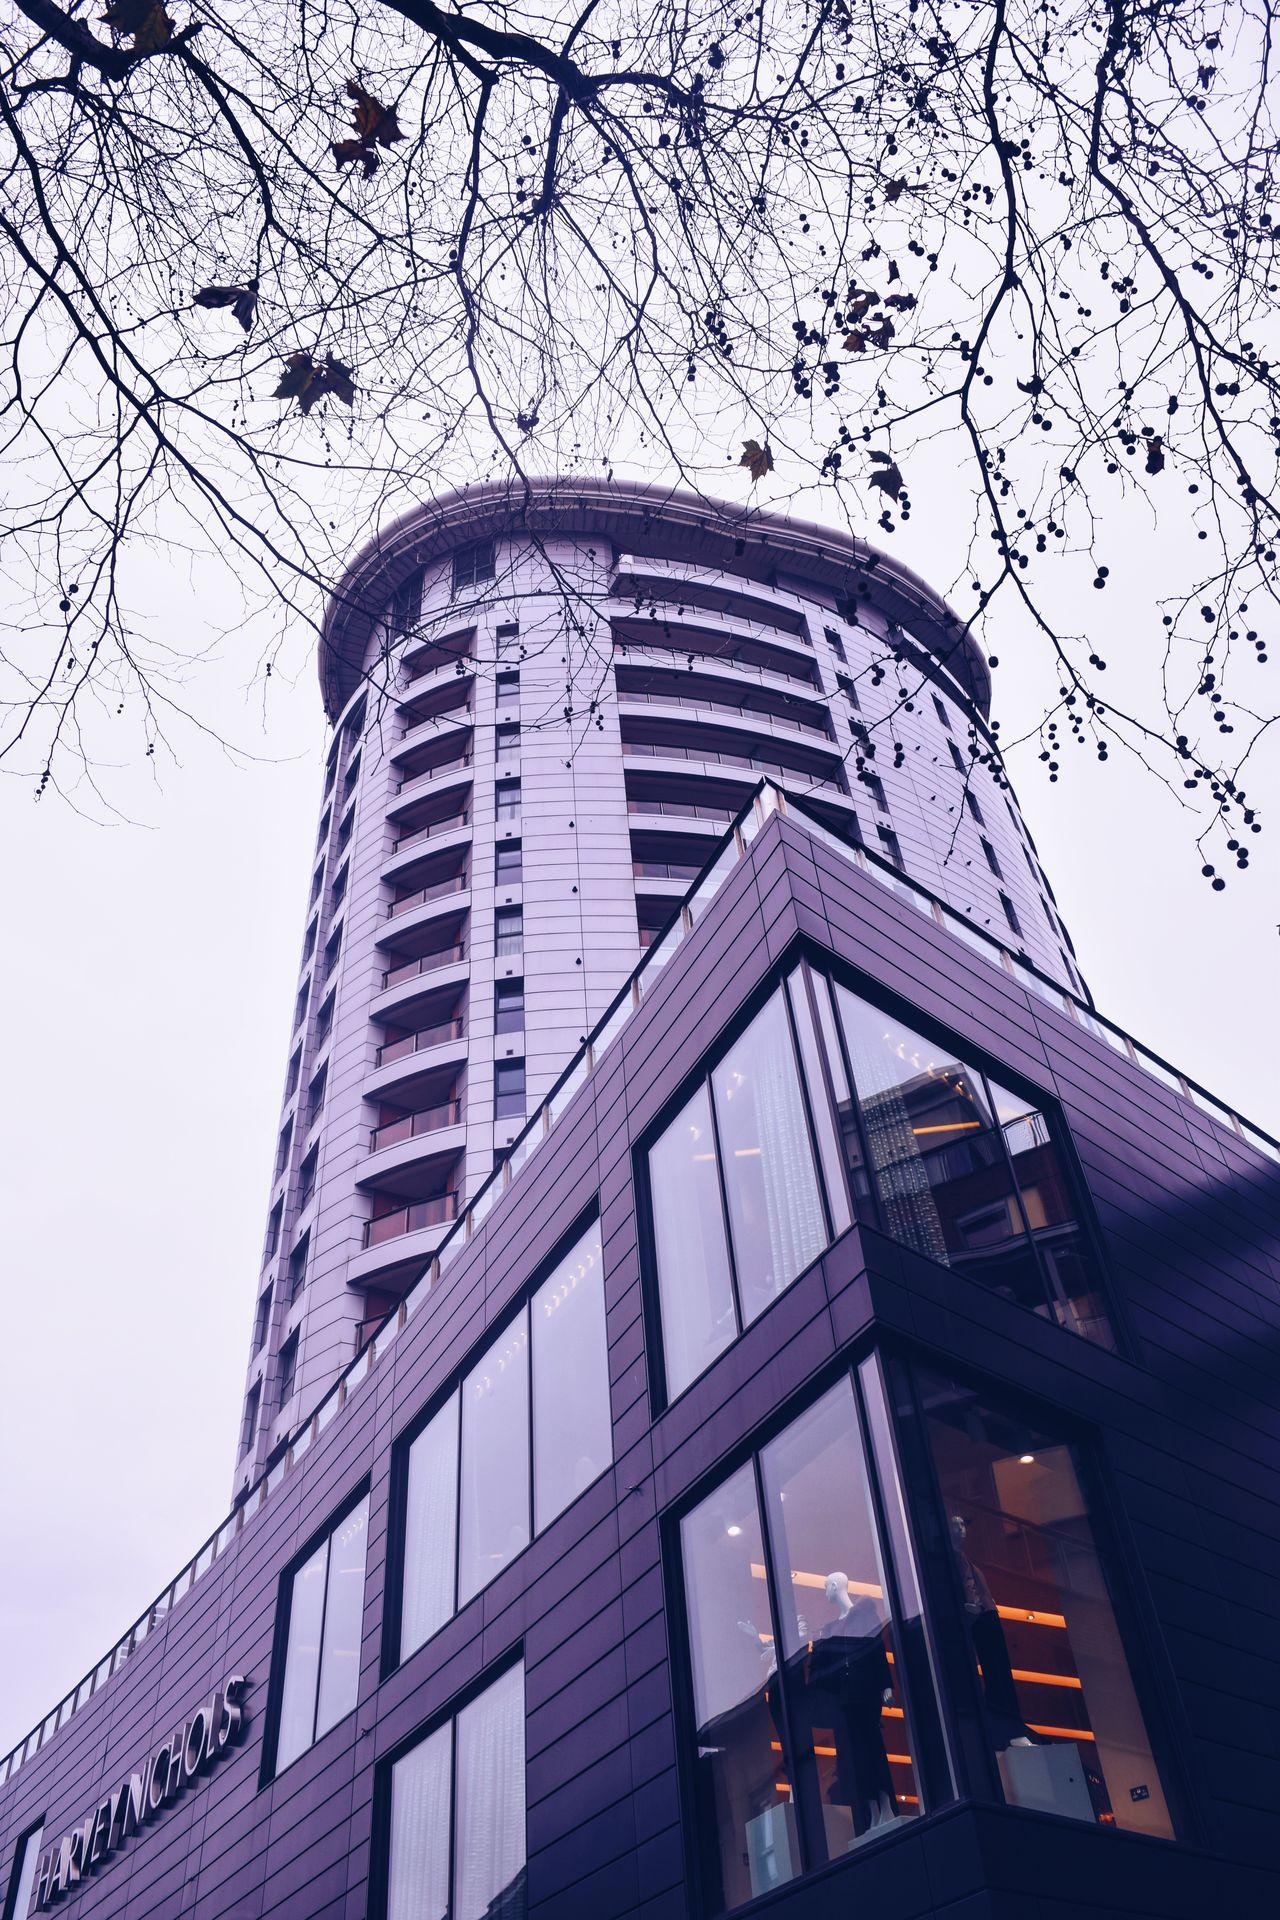 Buildings Architecture Design Outdoors Sky Trees Windows Lights Bristol United Kingdom